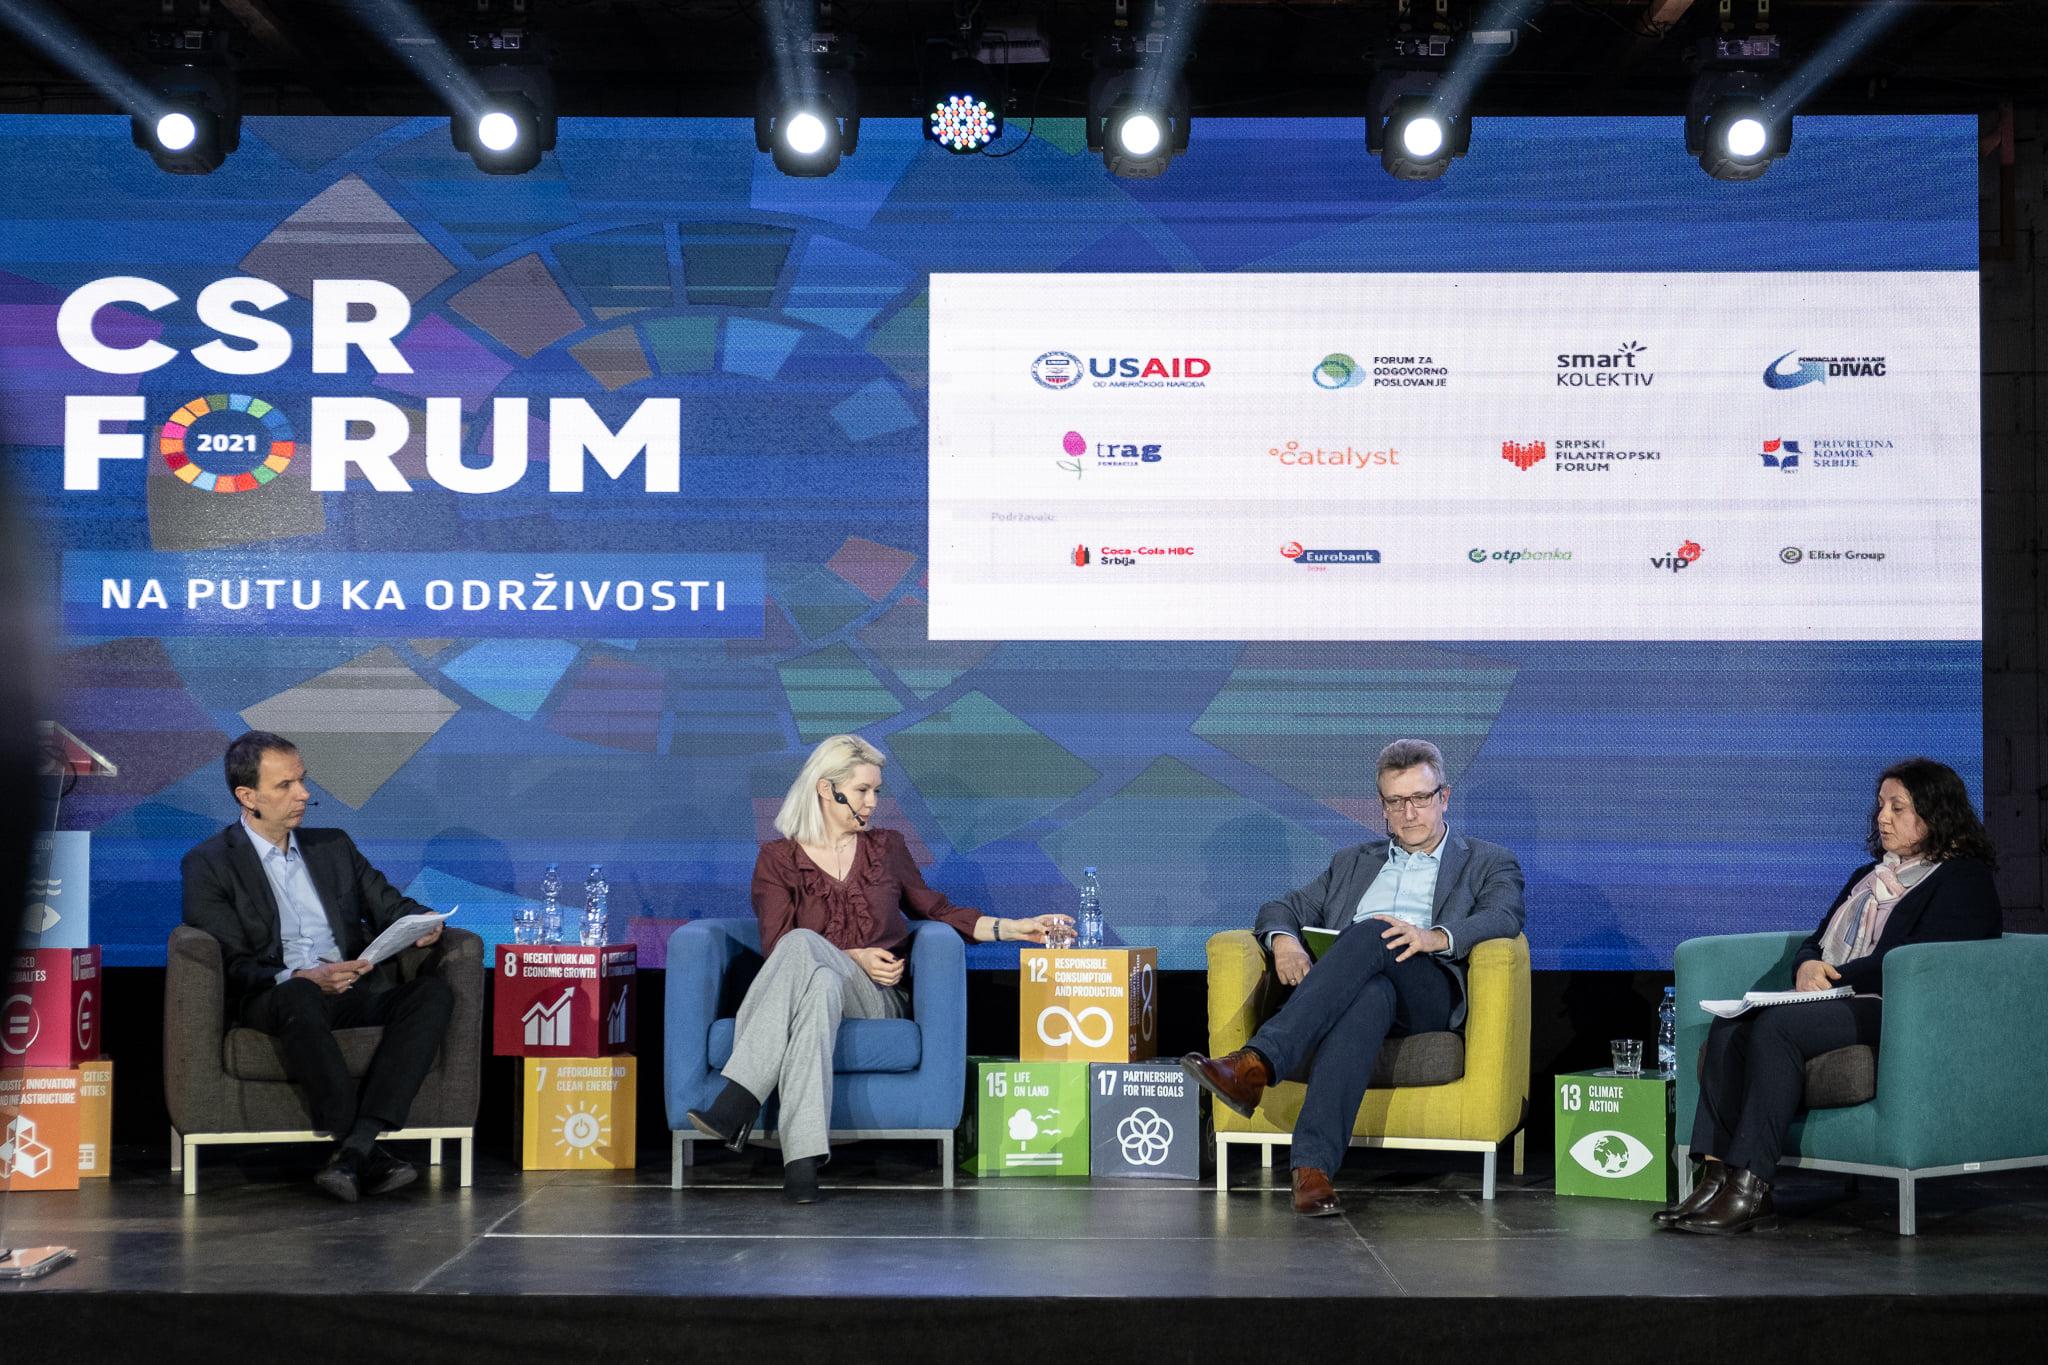 CSR Forum 2021